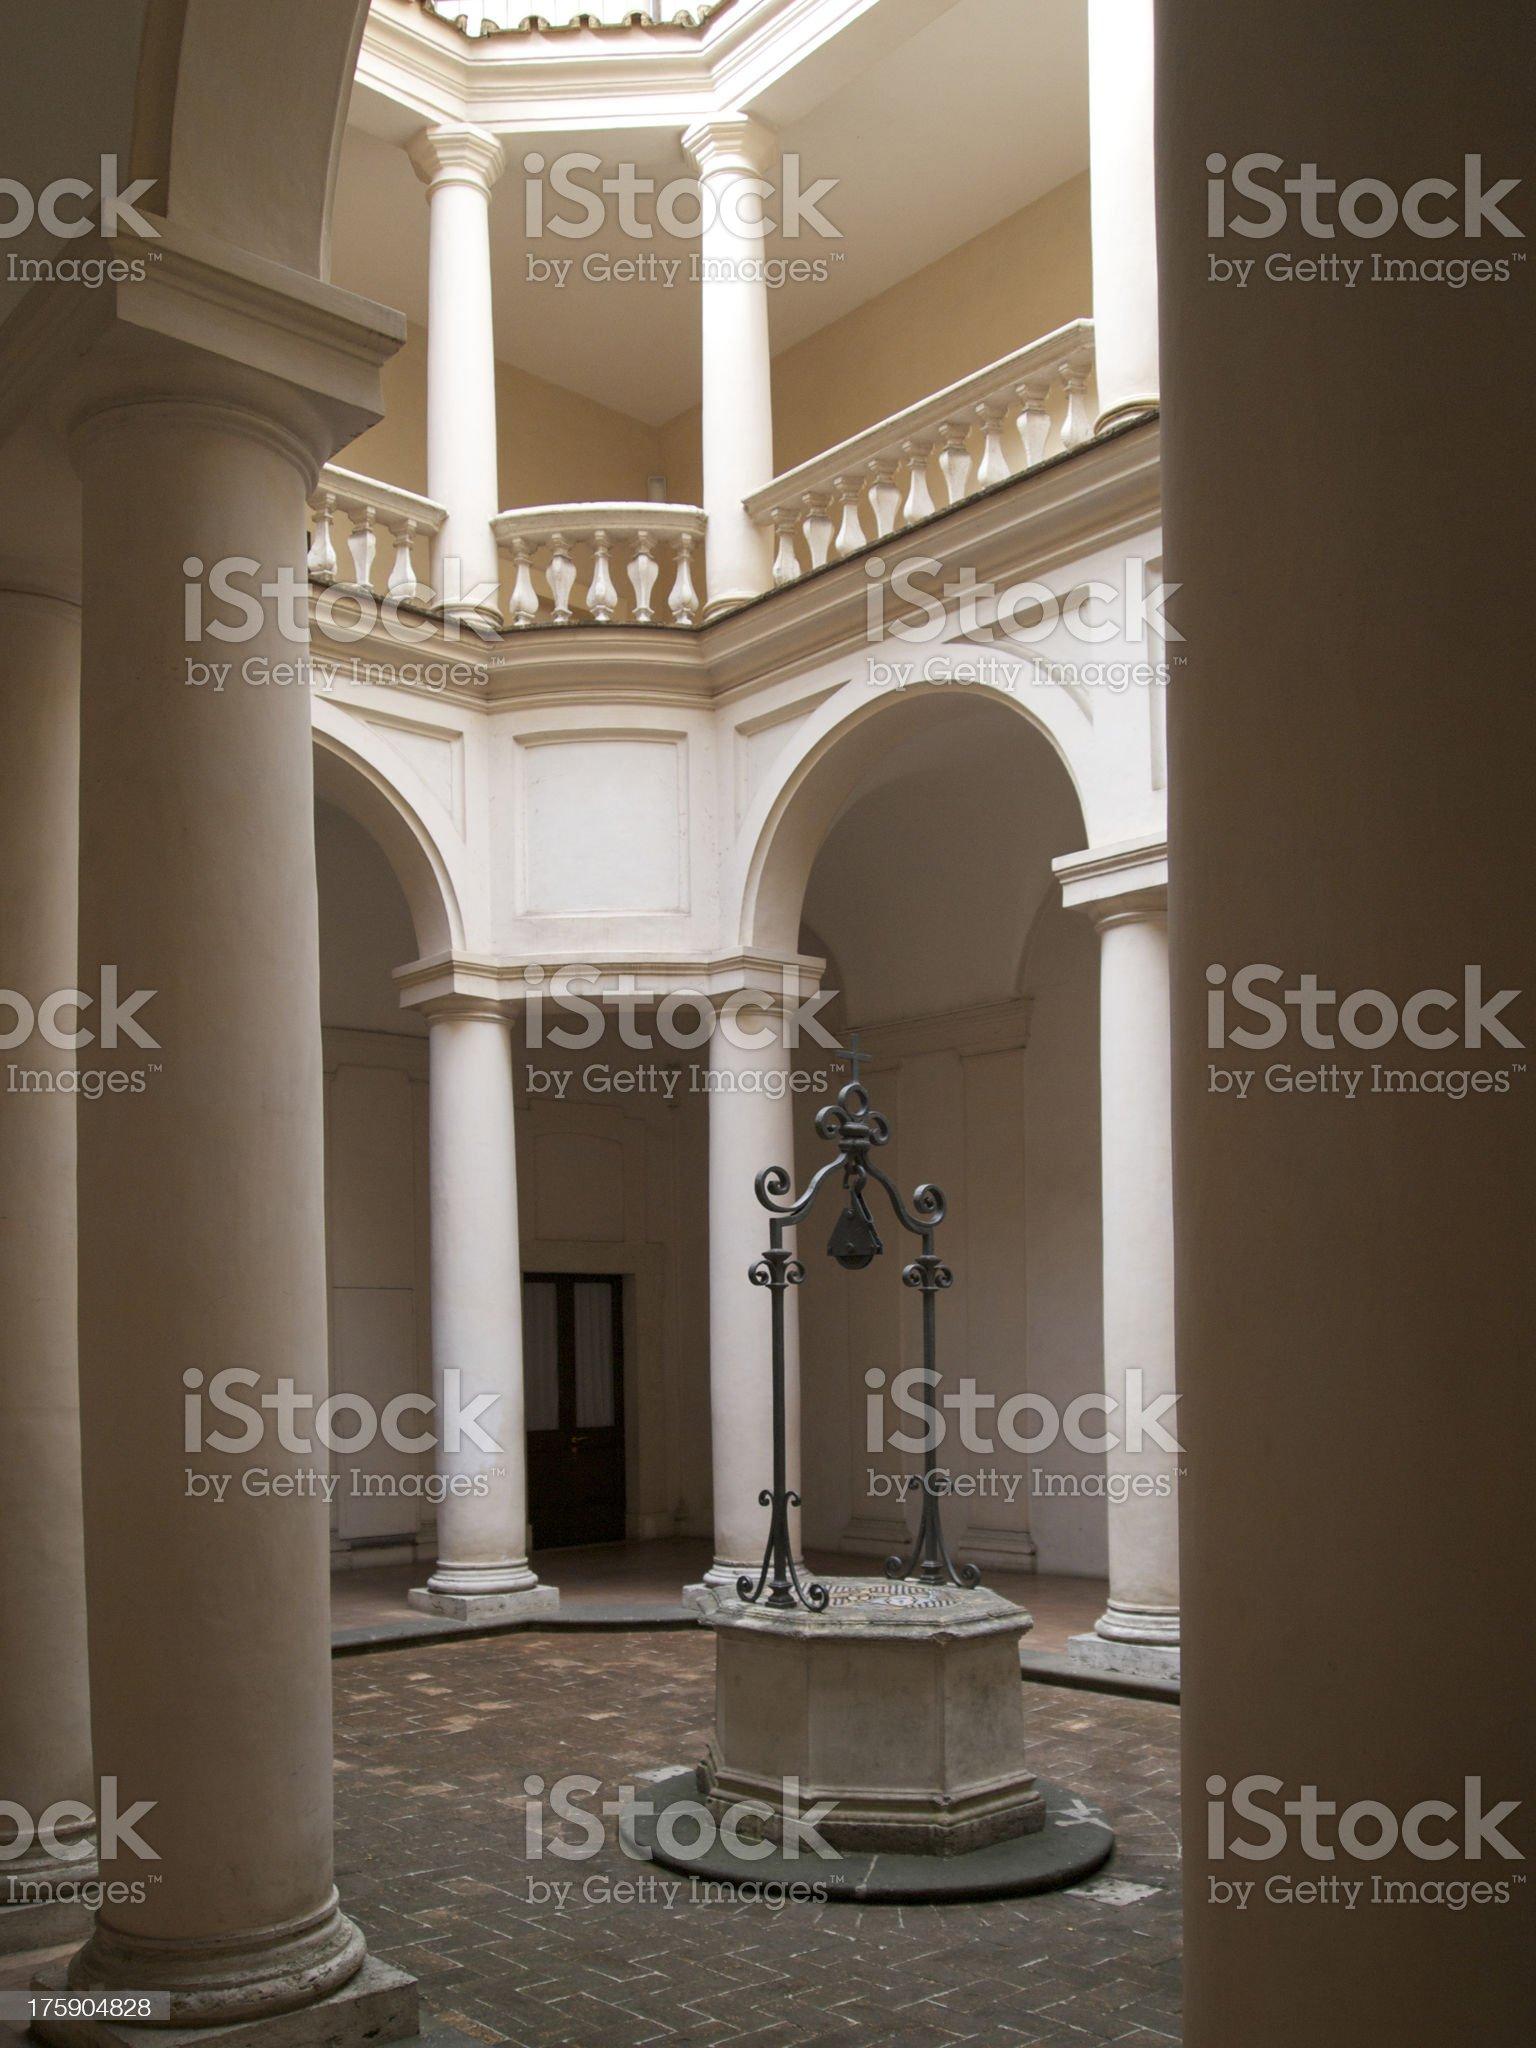 Around the cloister of San Carlo alle Quattro Fontane royalty-free stock photo